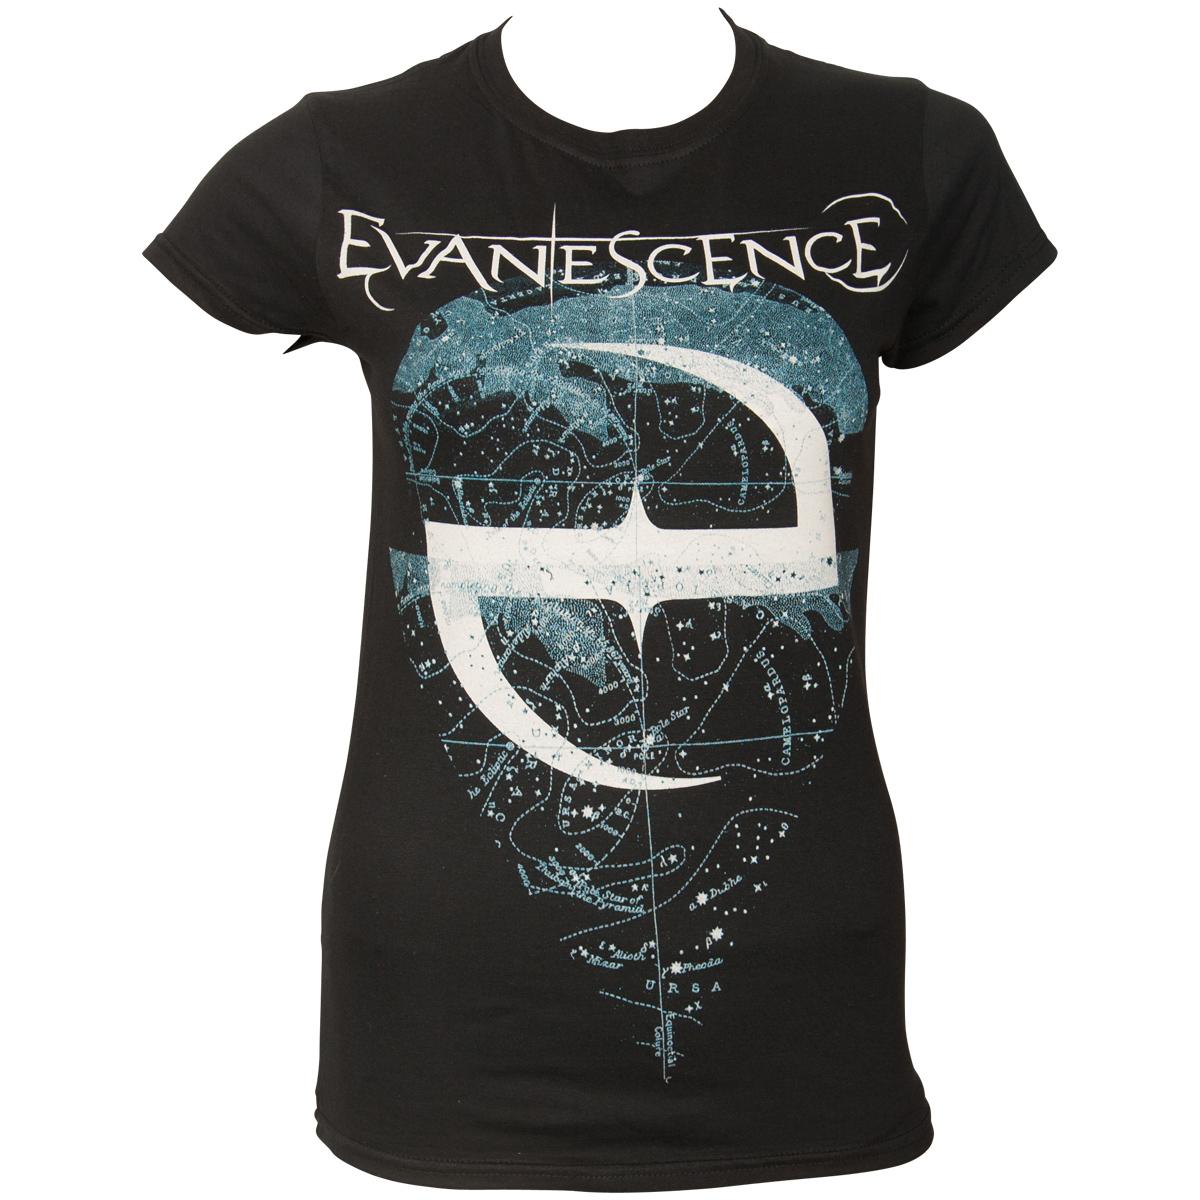 Evanescence - Damen T-Shirt Space Map - schwarz